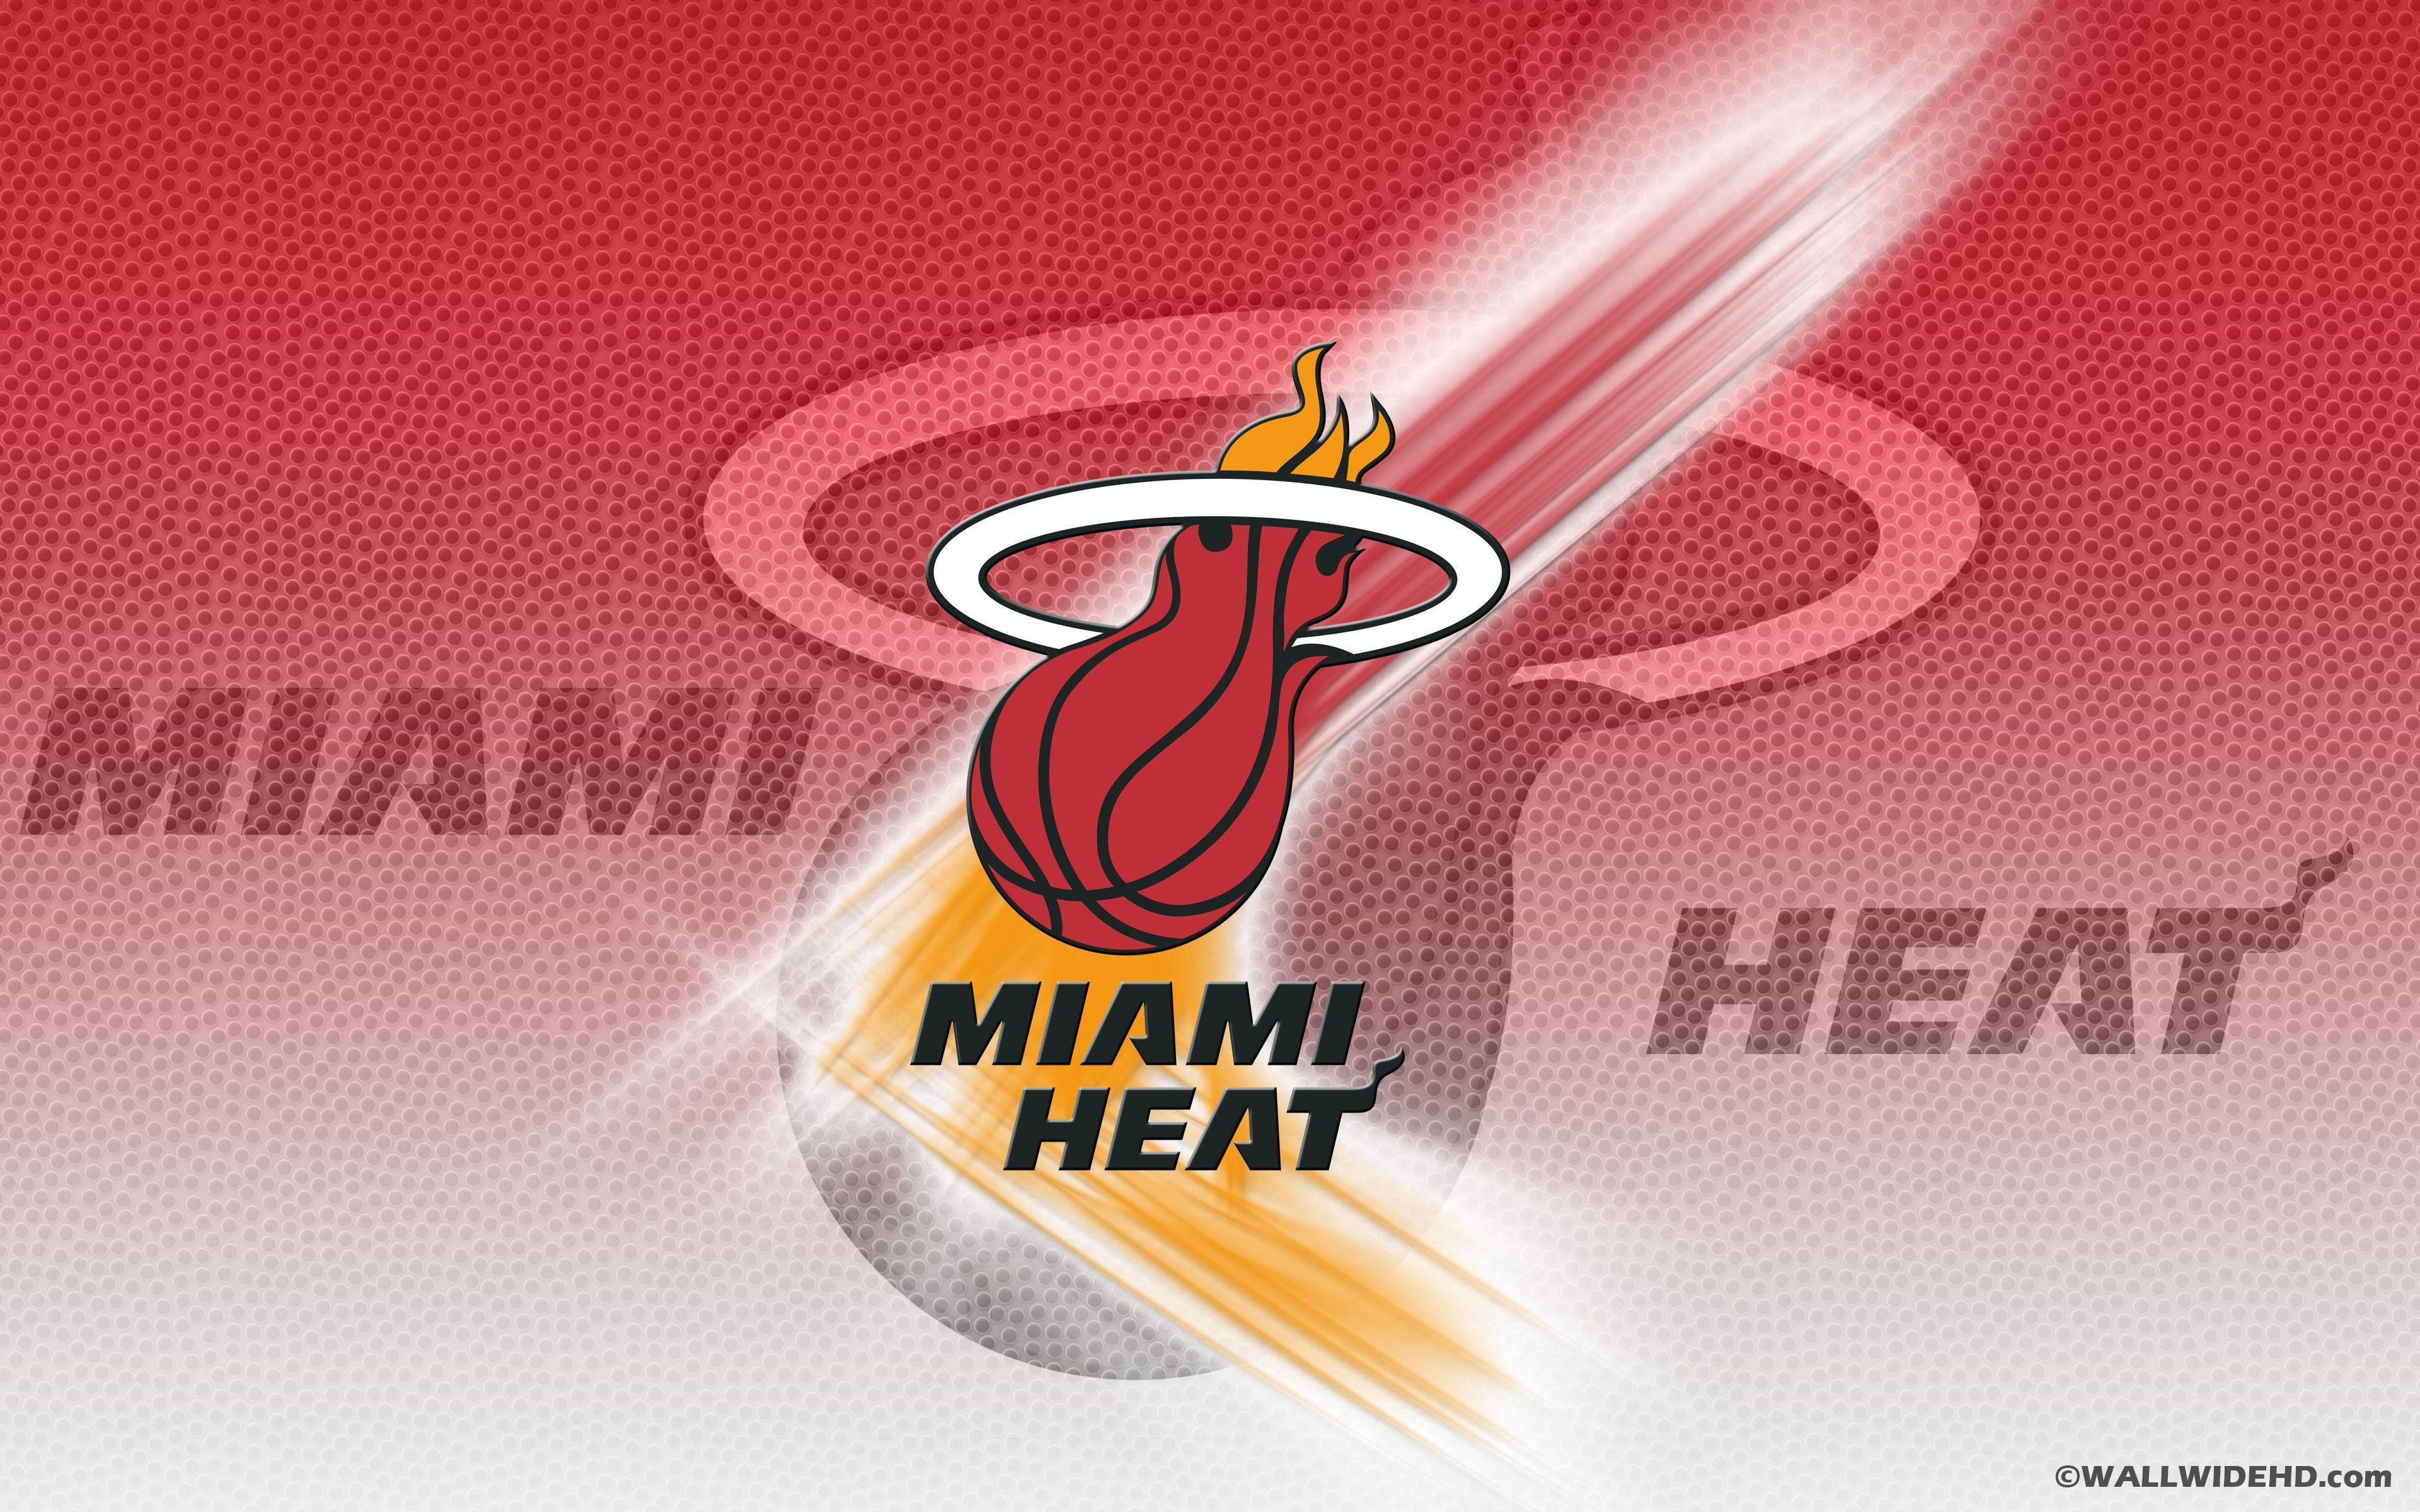 Miami Heat Backgrounds 2016 - Wallpaper Cave